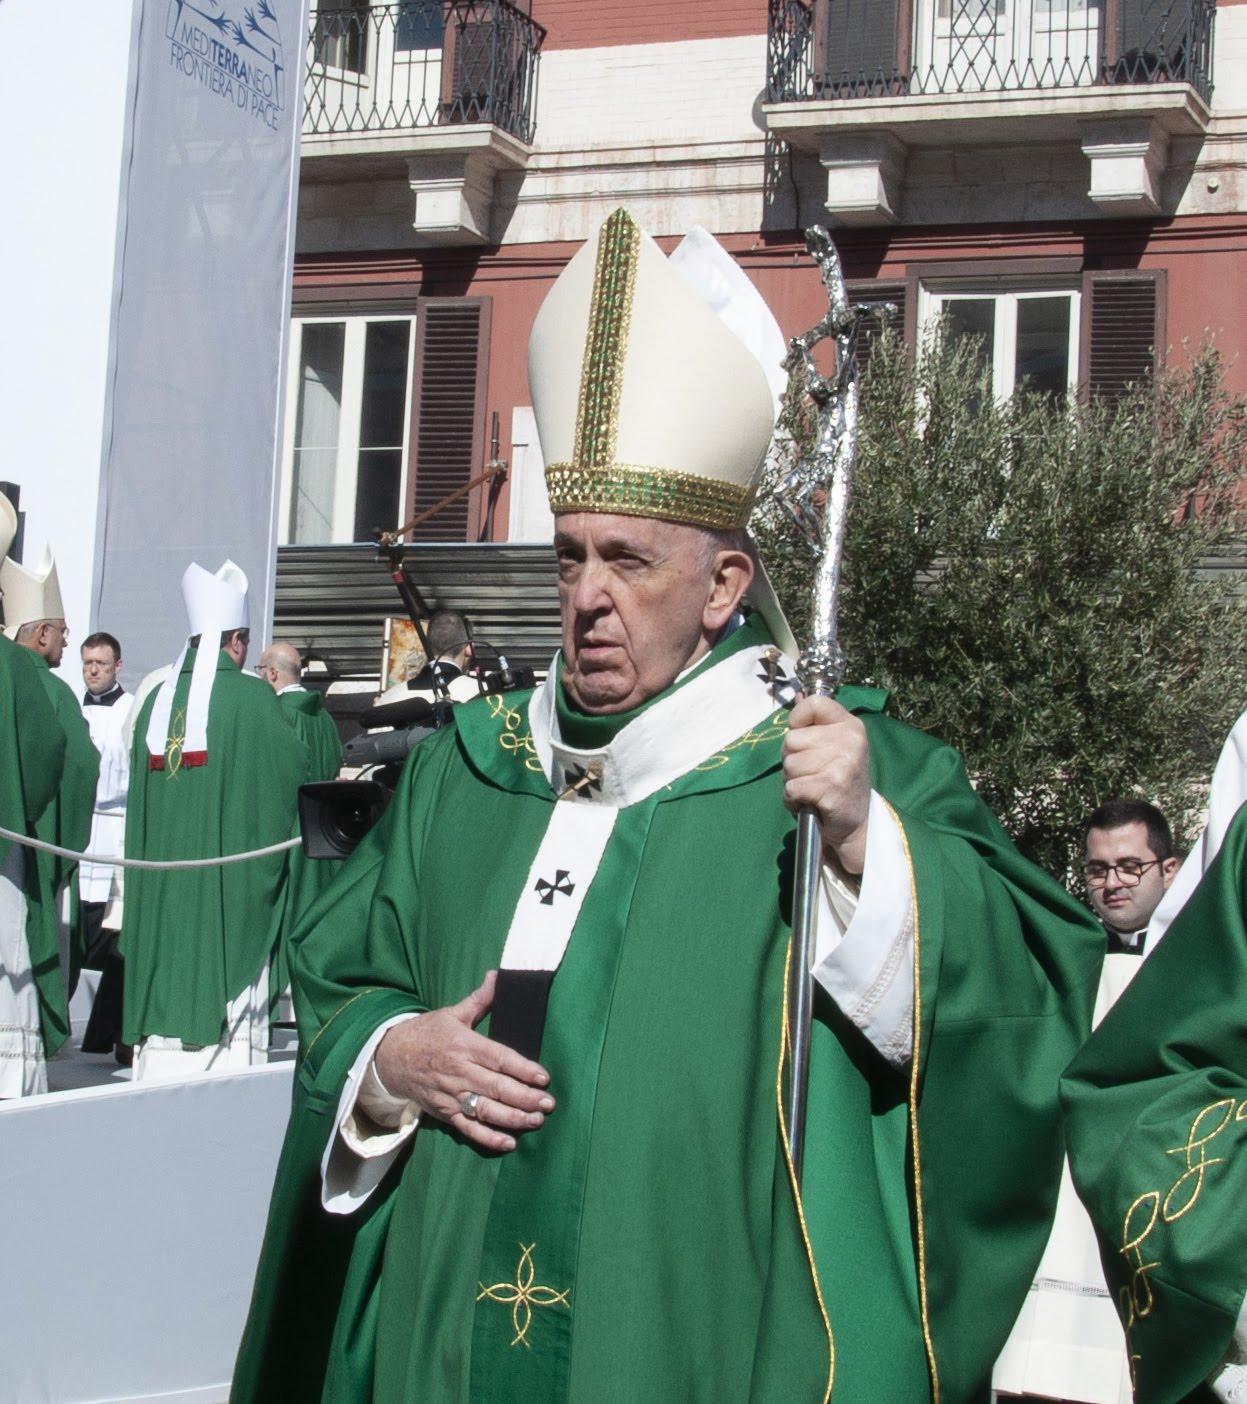 20200223 Bari Papa Francesco 57 (Copia di NXPowerLite).jpg